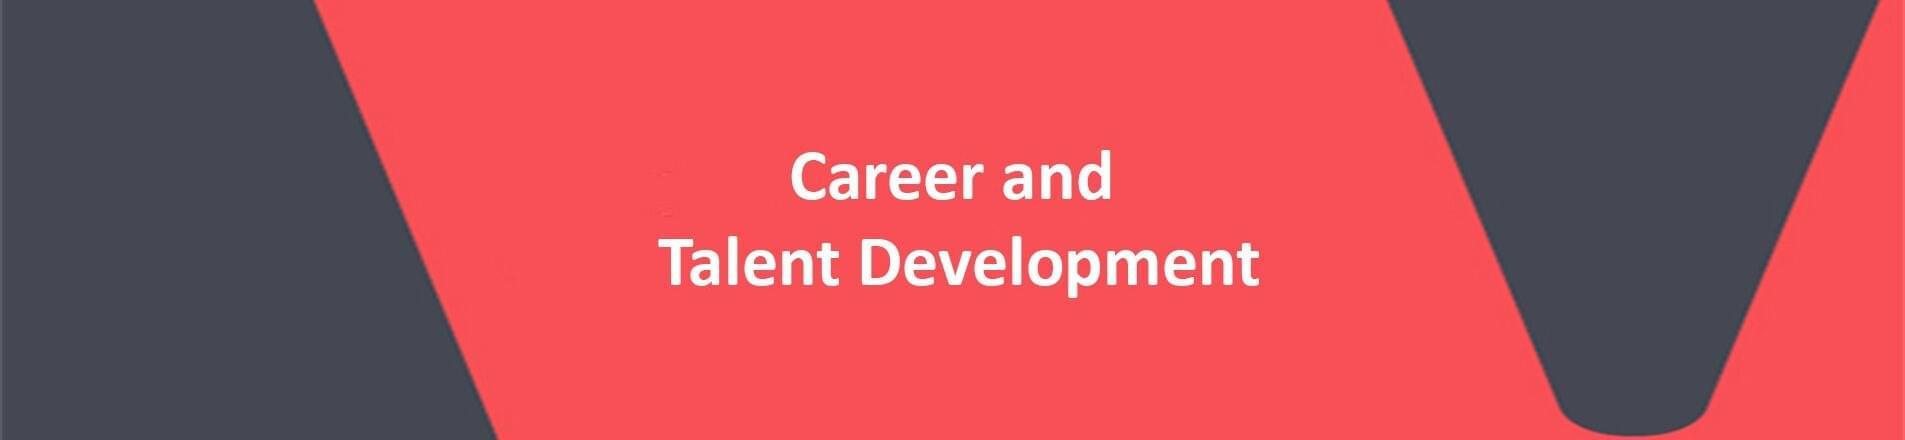 Career and Talent Development .